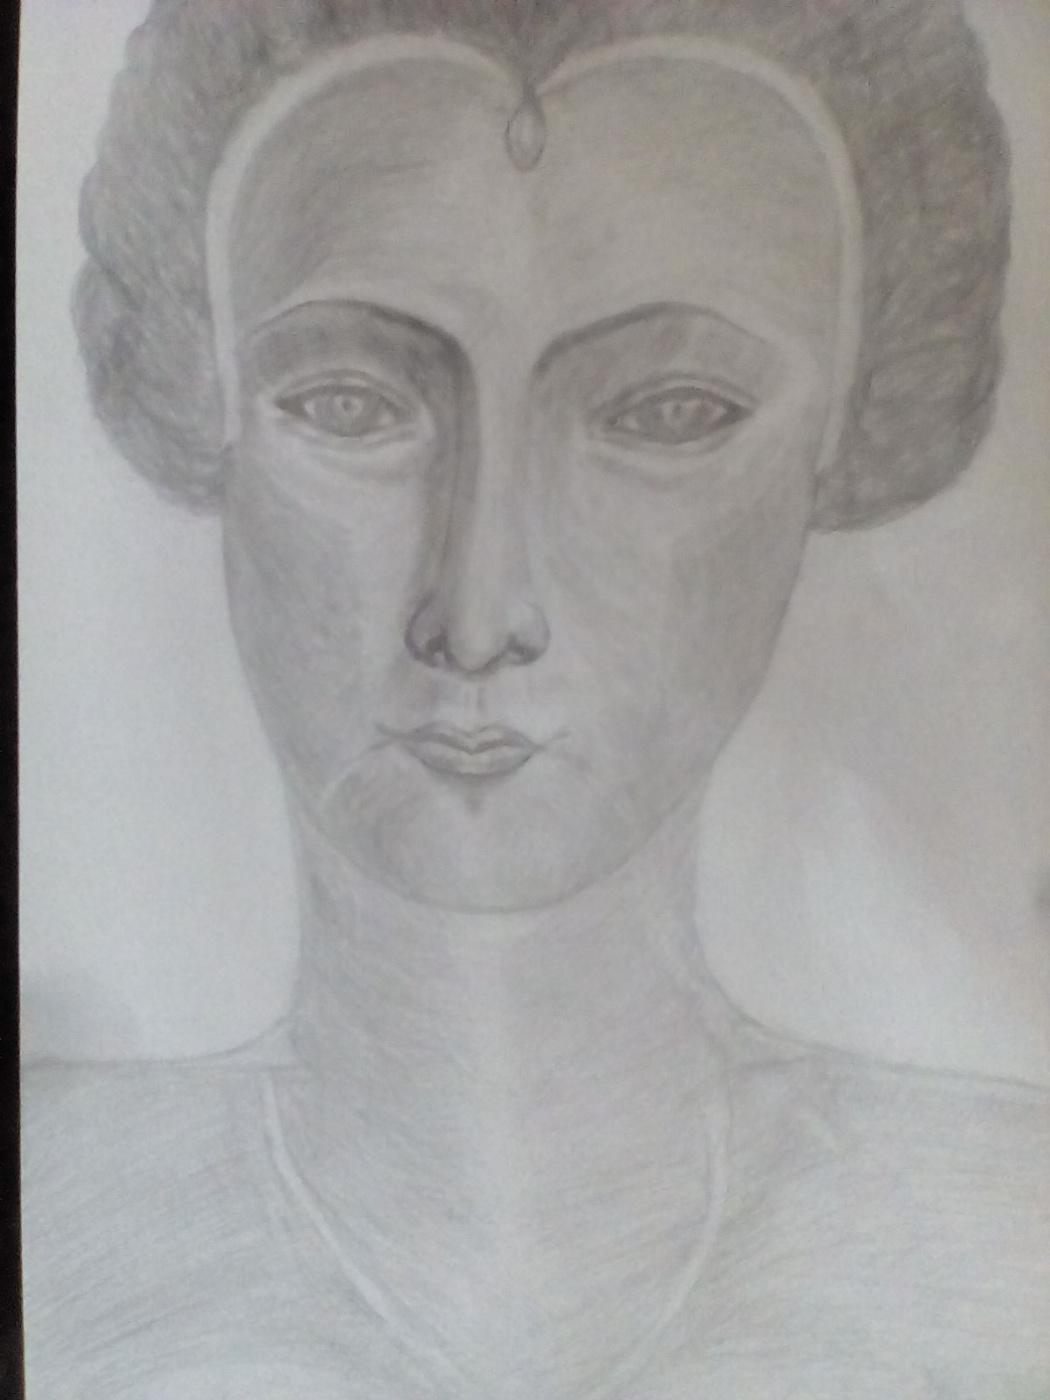 Oljga Vasiljevna. Noble lady from the 16th century